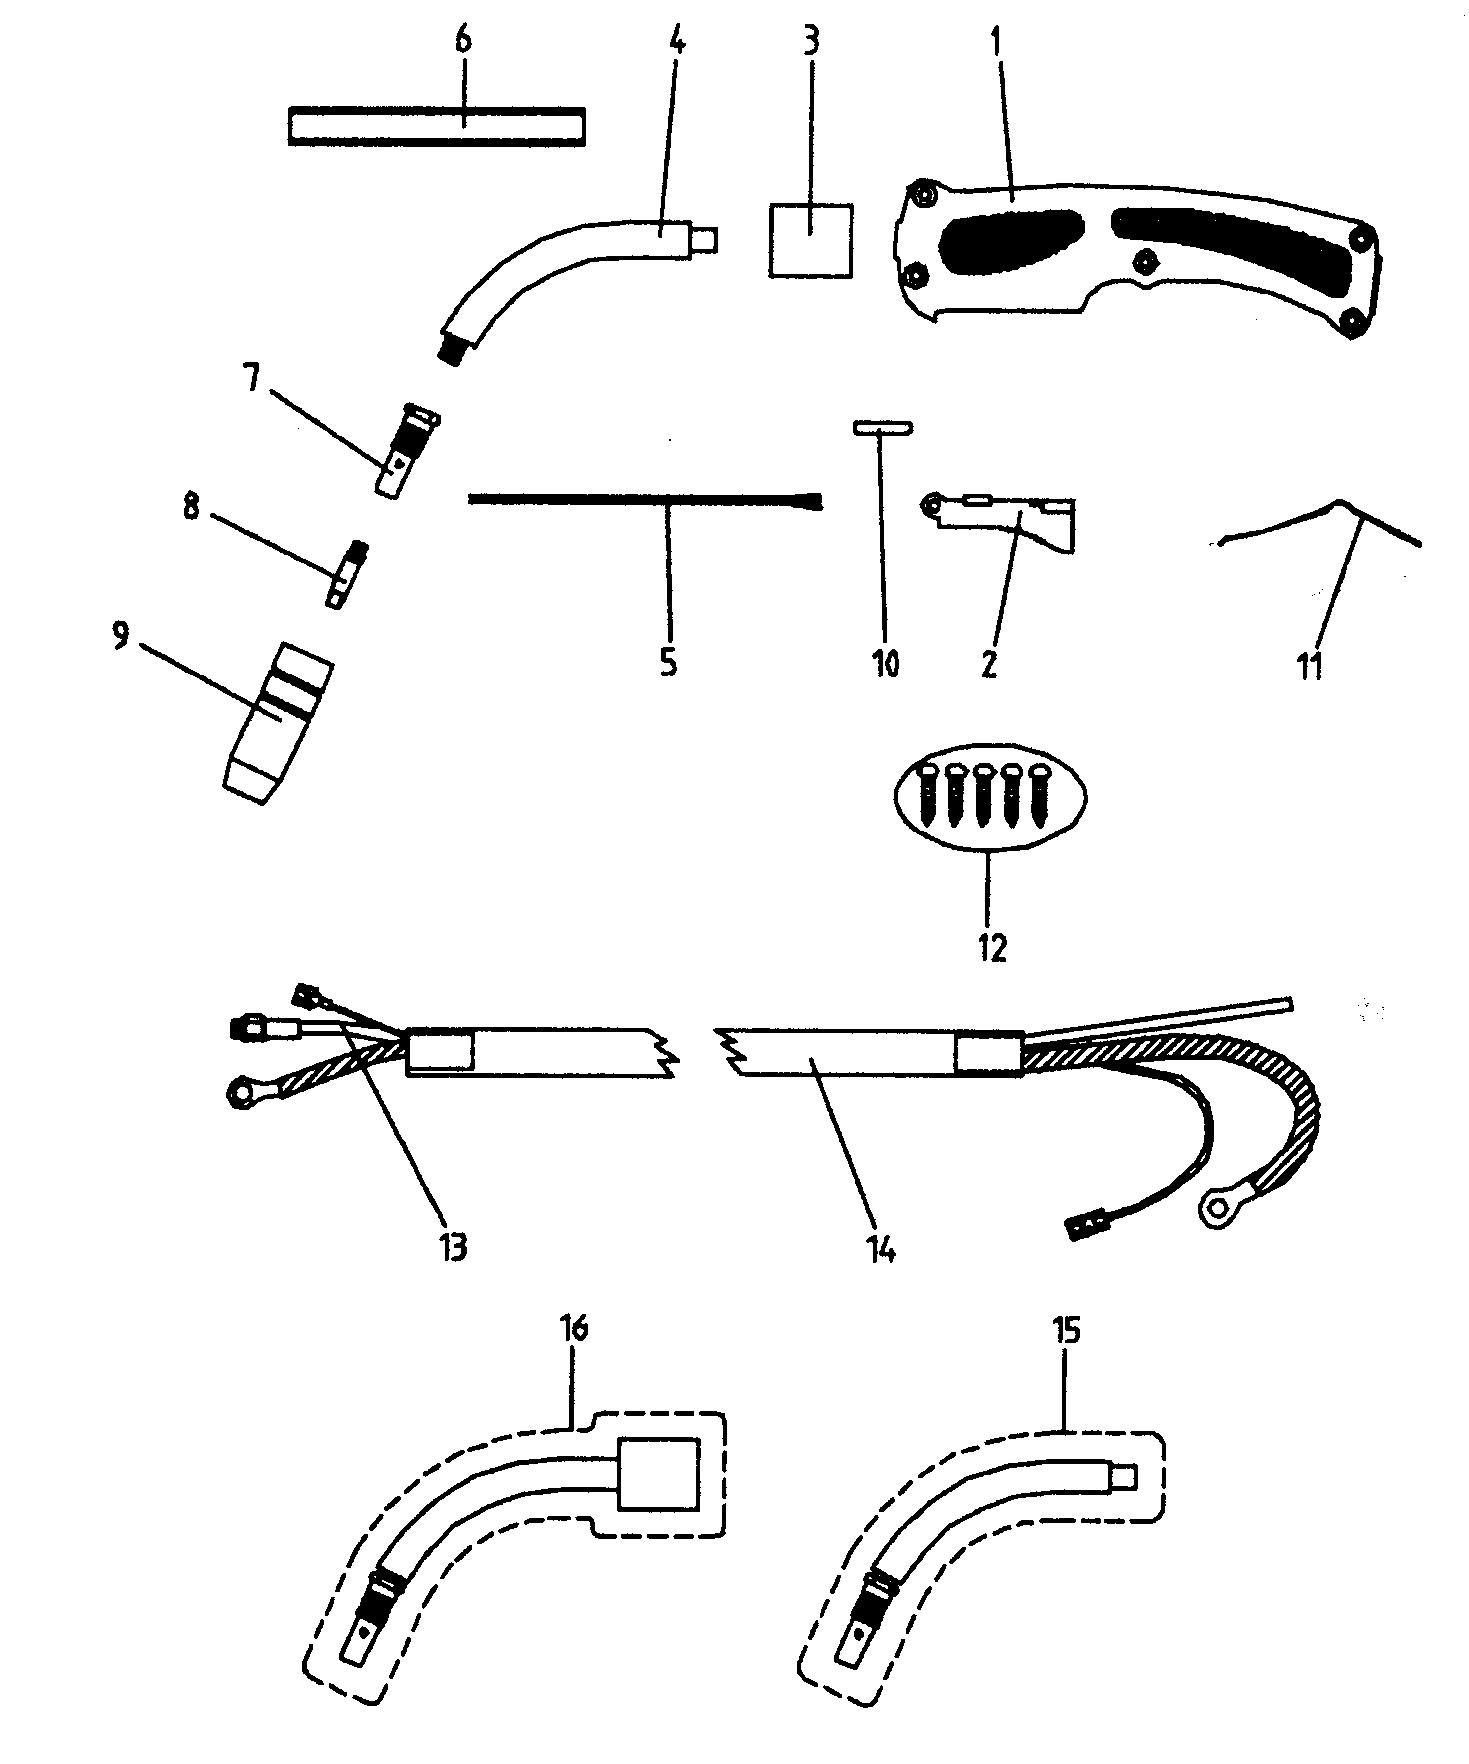 wire diagram danmoto sp 00002